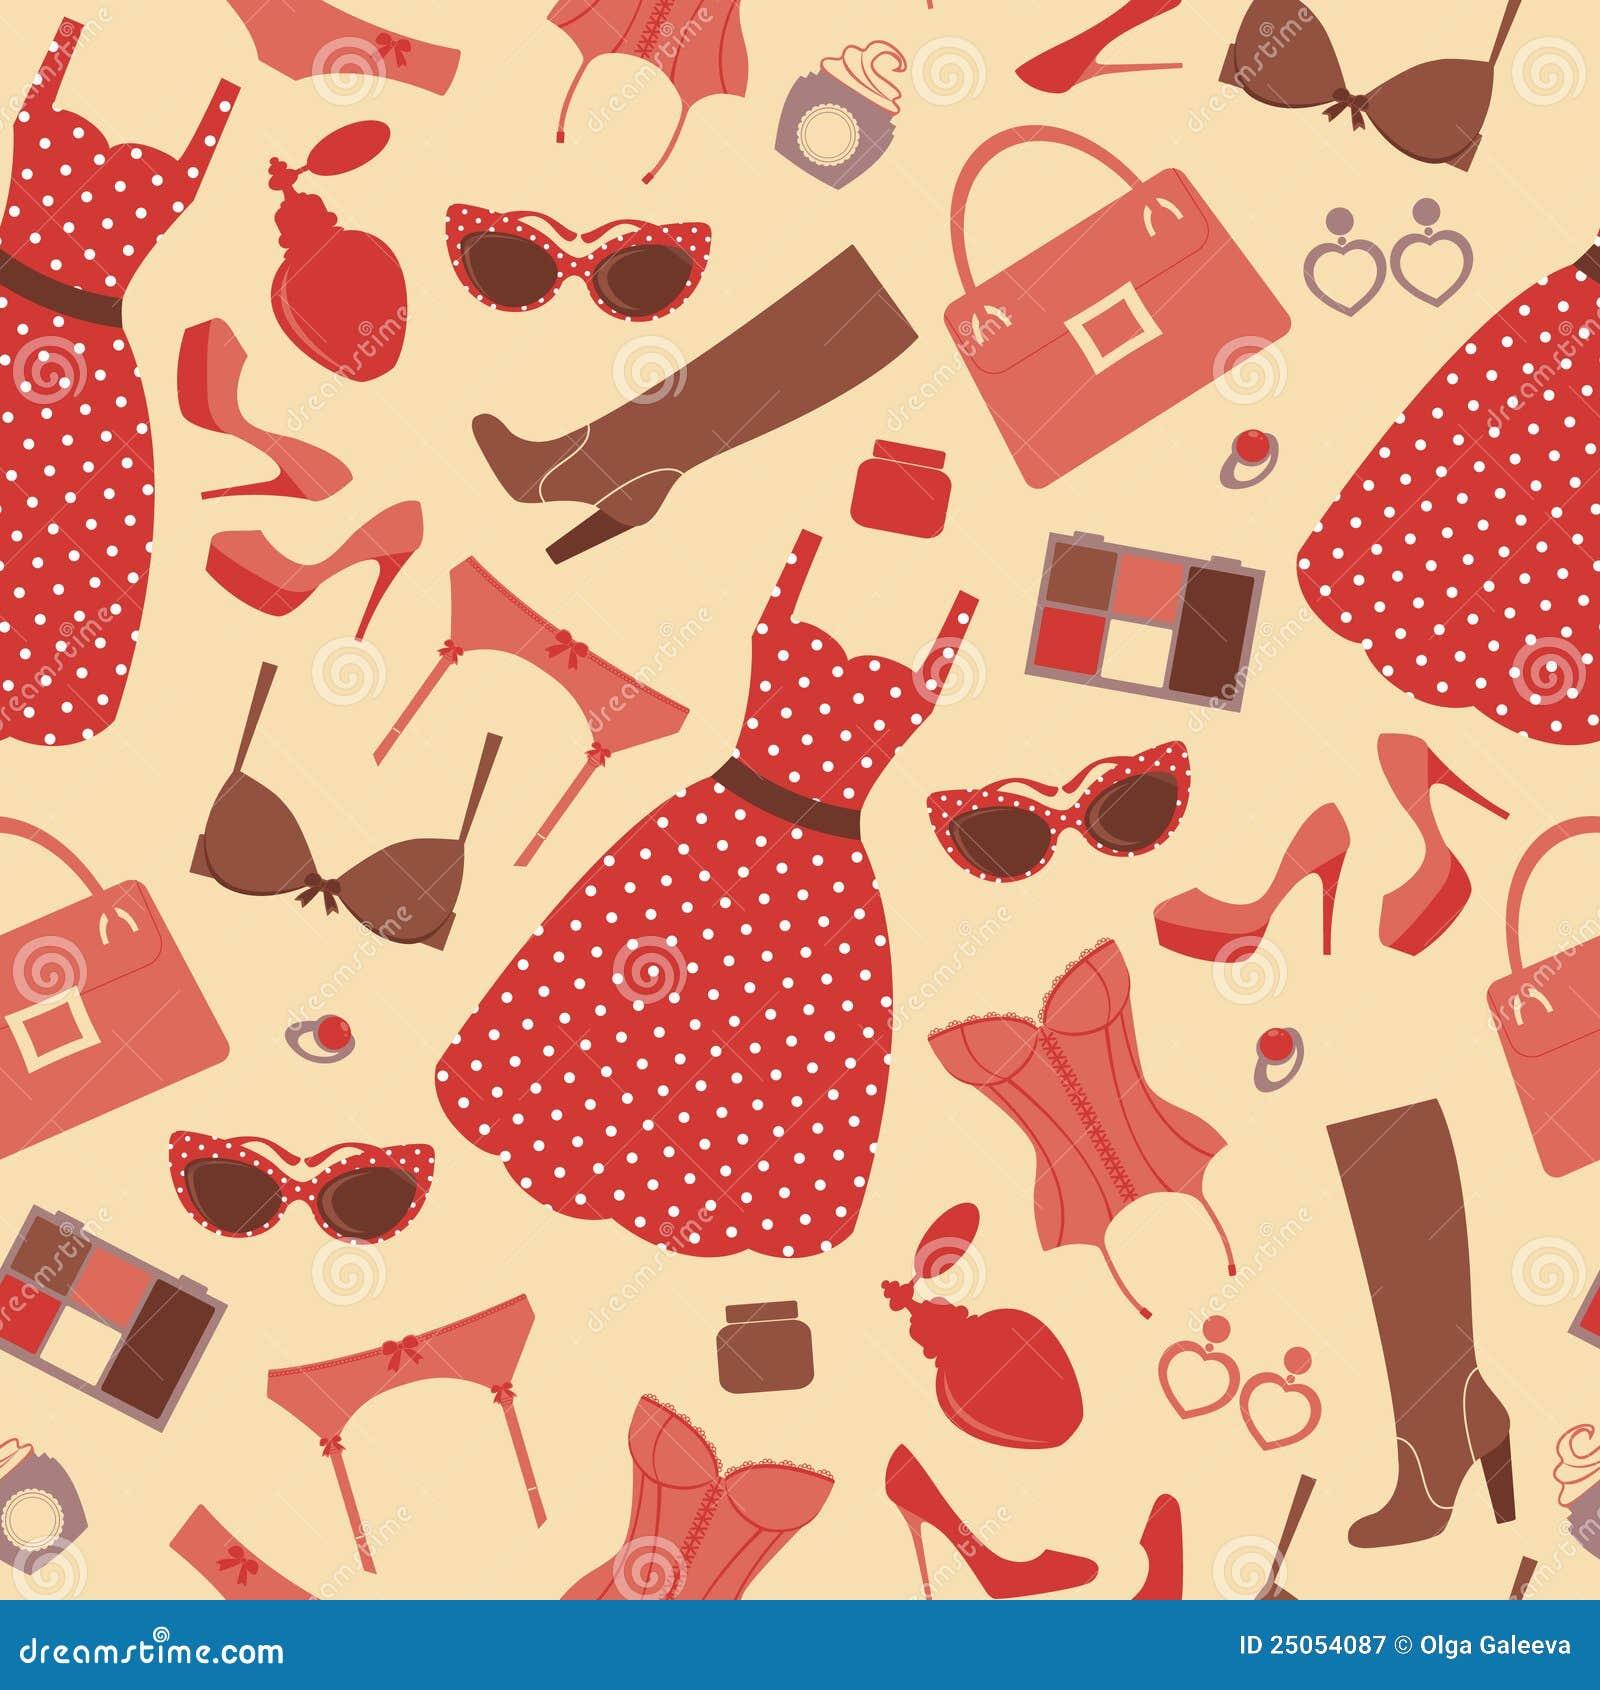 Fashion patterns free download Vector Flower, free downloads vector, Patterns Diwen